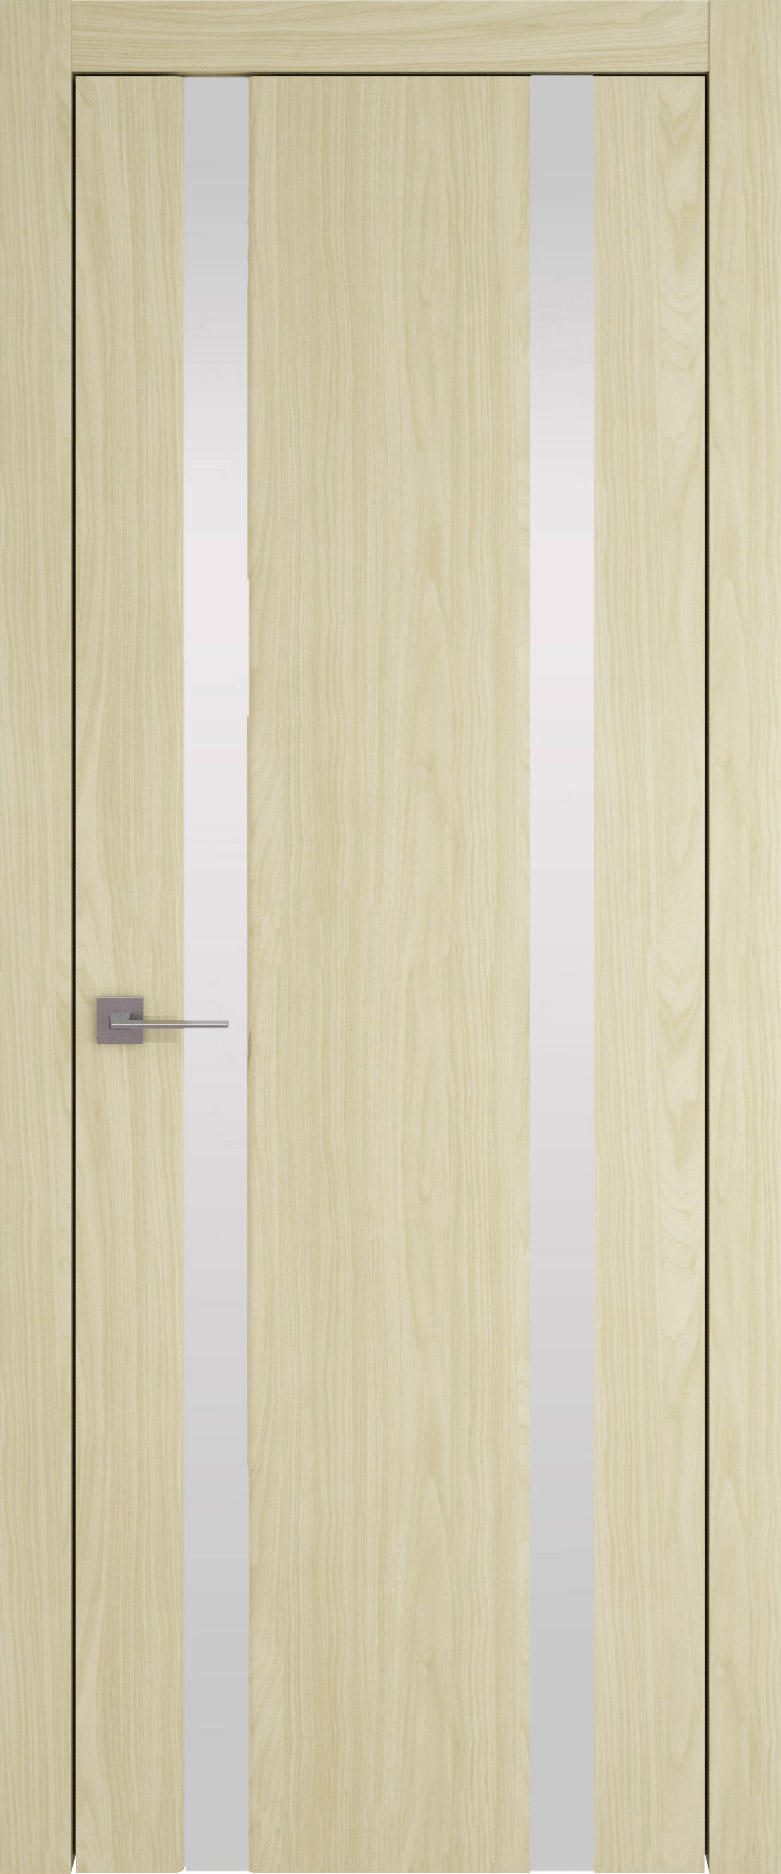 Torino цвет - Дуб нордик Без стекла (ДГ-2)